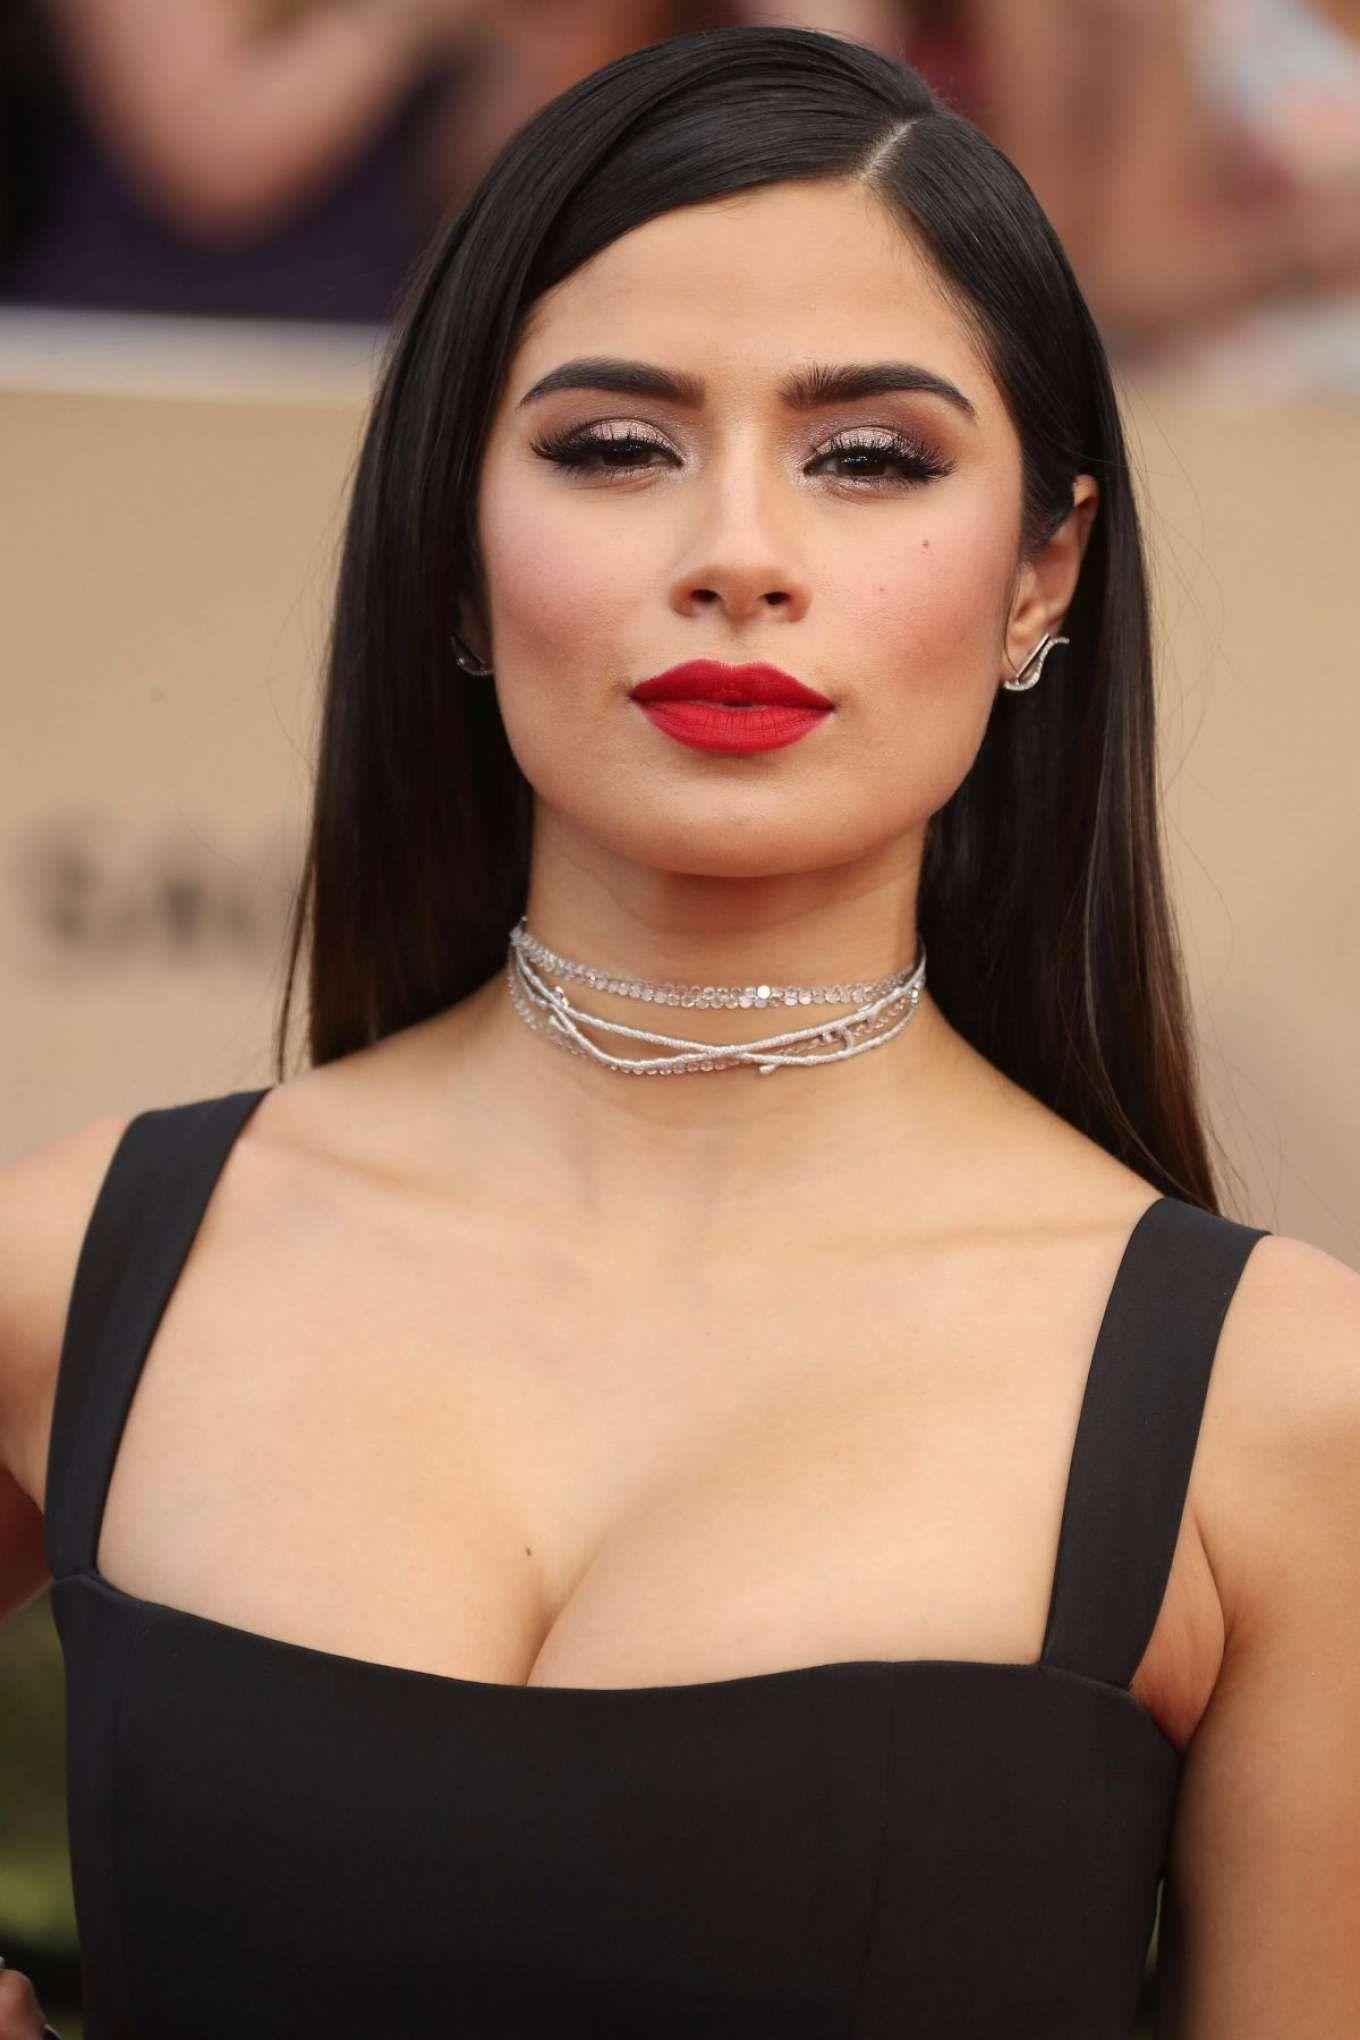 Diane Guerrero sexy. 2018-2019 celebrityes photos leaks!